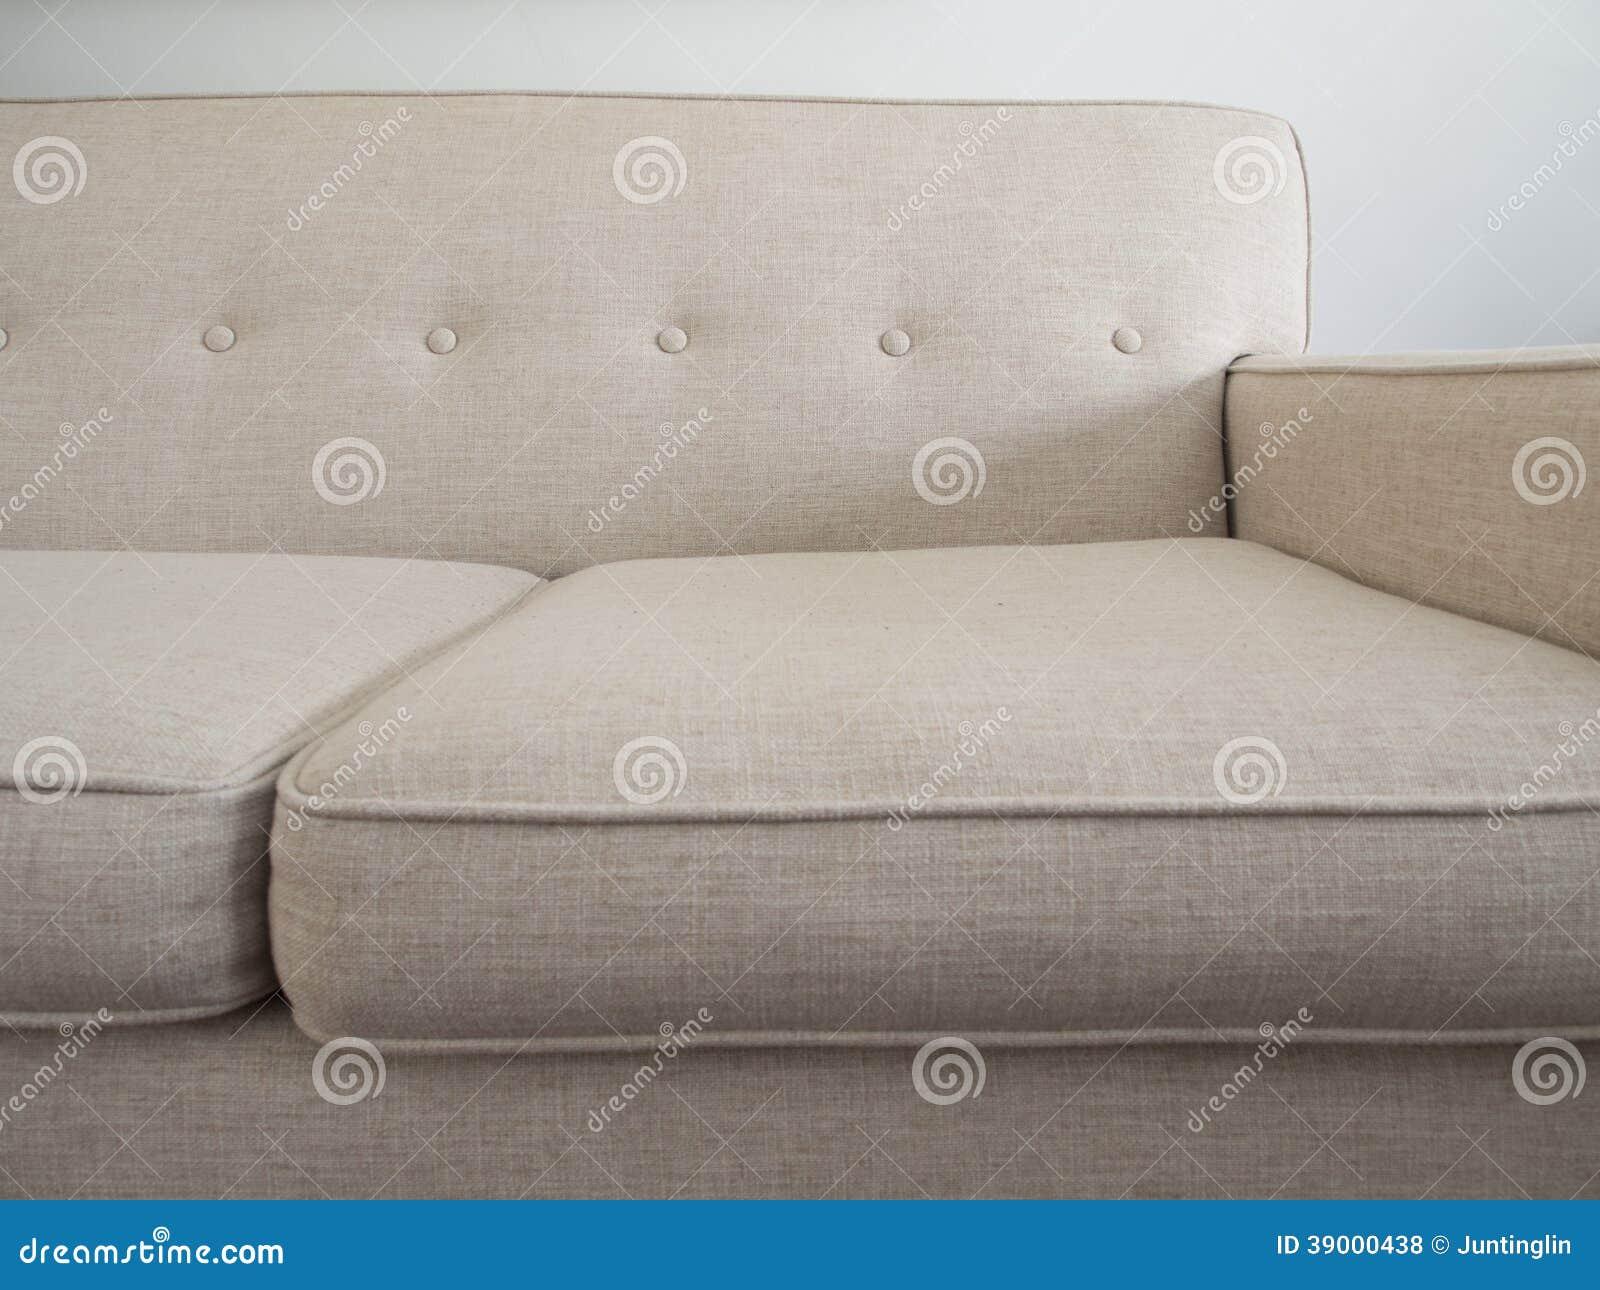 mid century modern sofa beige color stock photo image